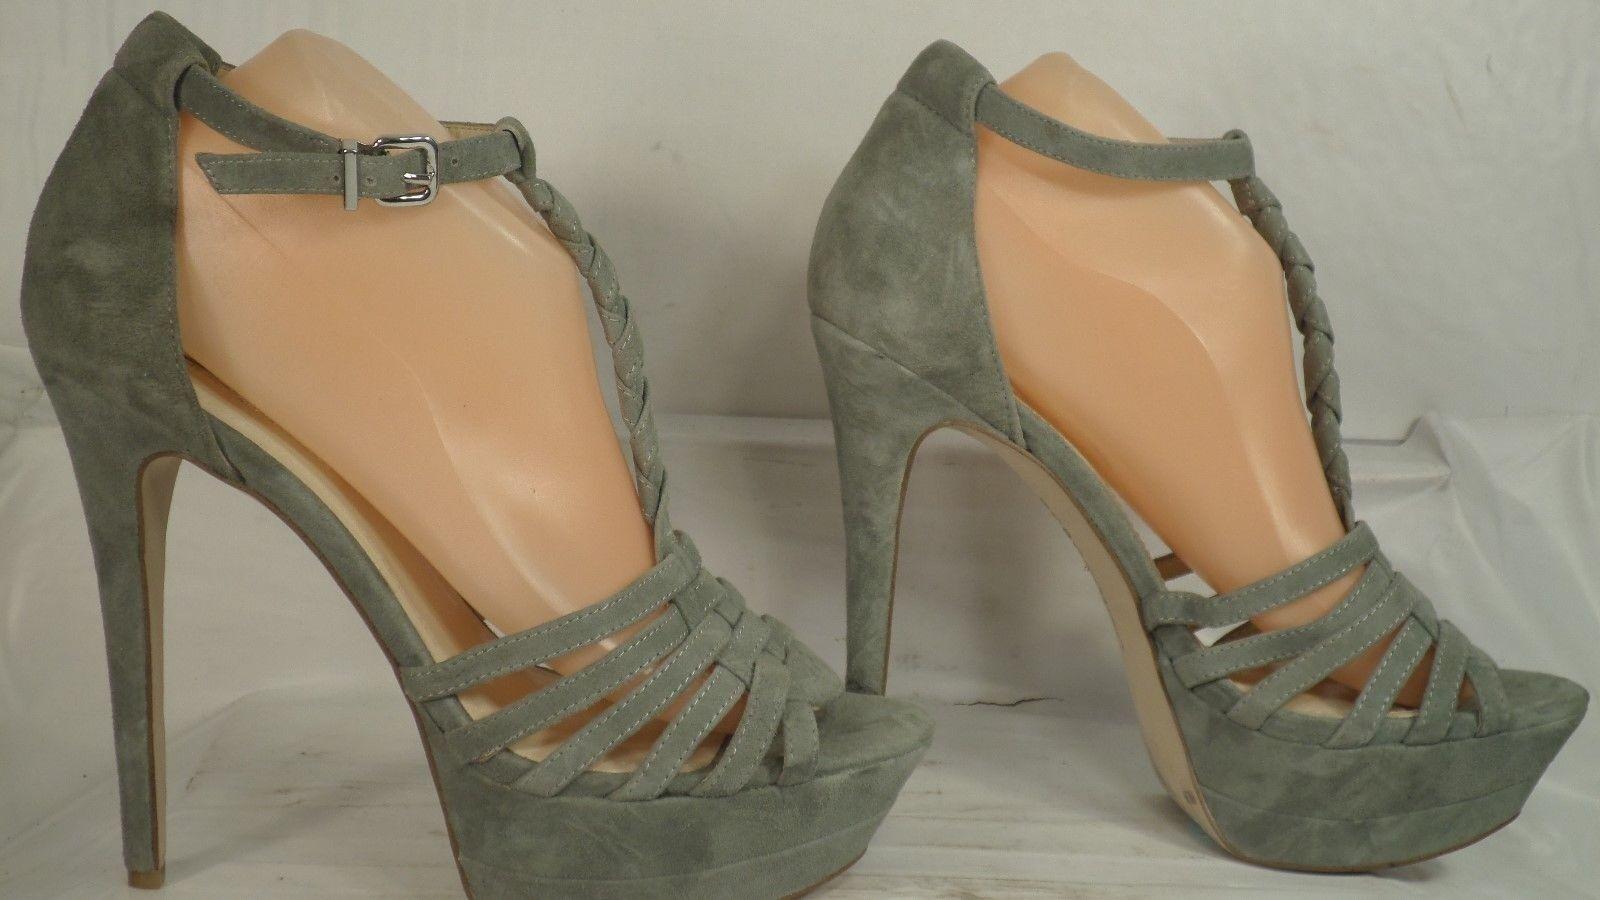 BCBGeneration  Vixen  Sage Green Suede Platform Dress Sandal Women Size 9 M